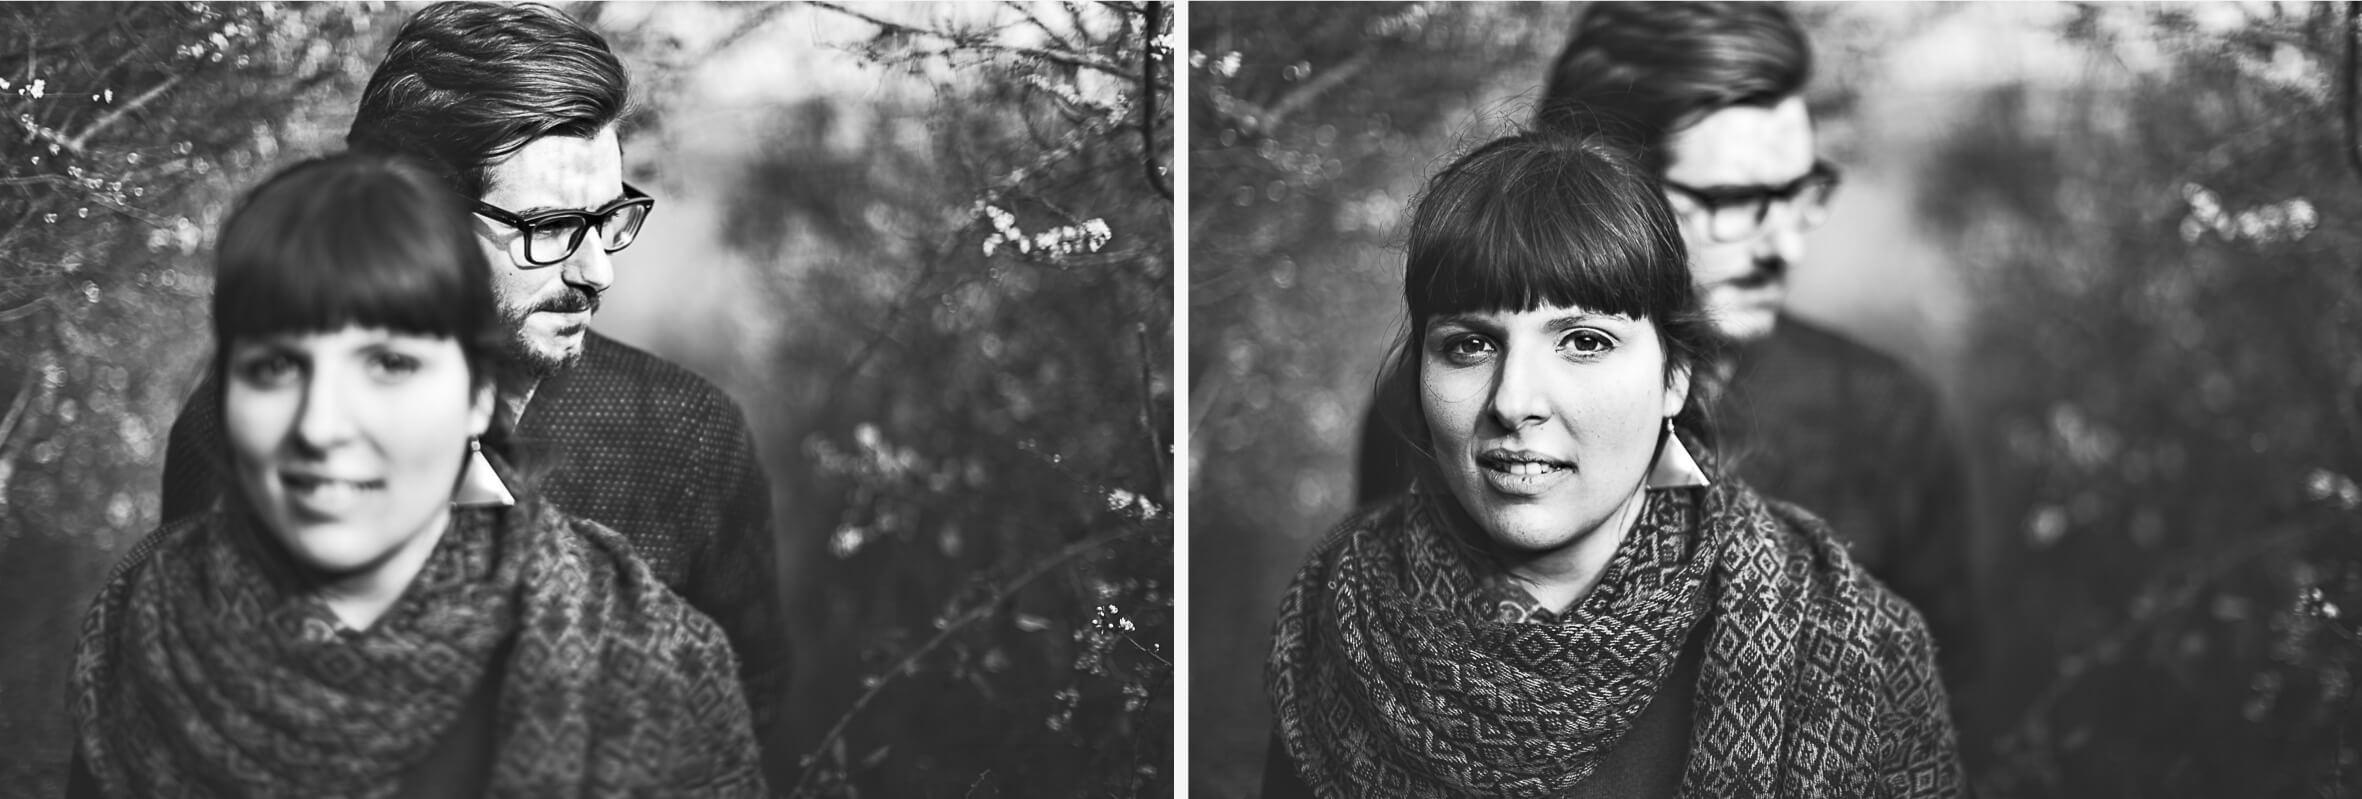 Photographe couple - Andrea & Brice-1-1